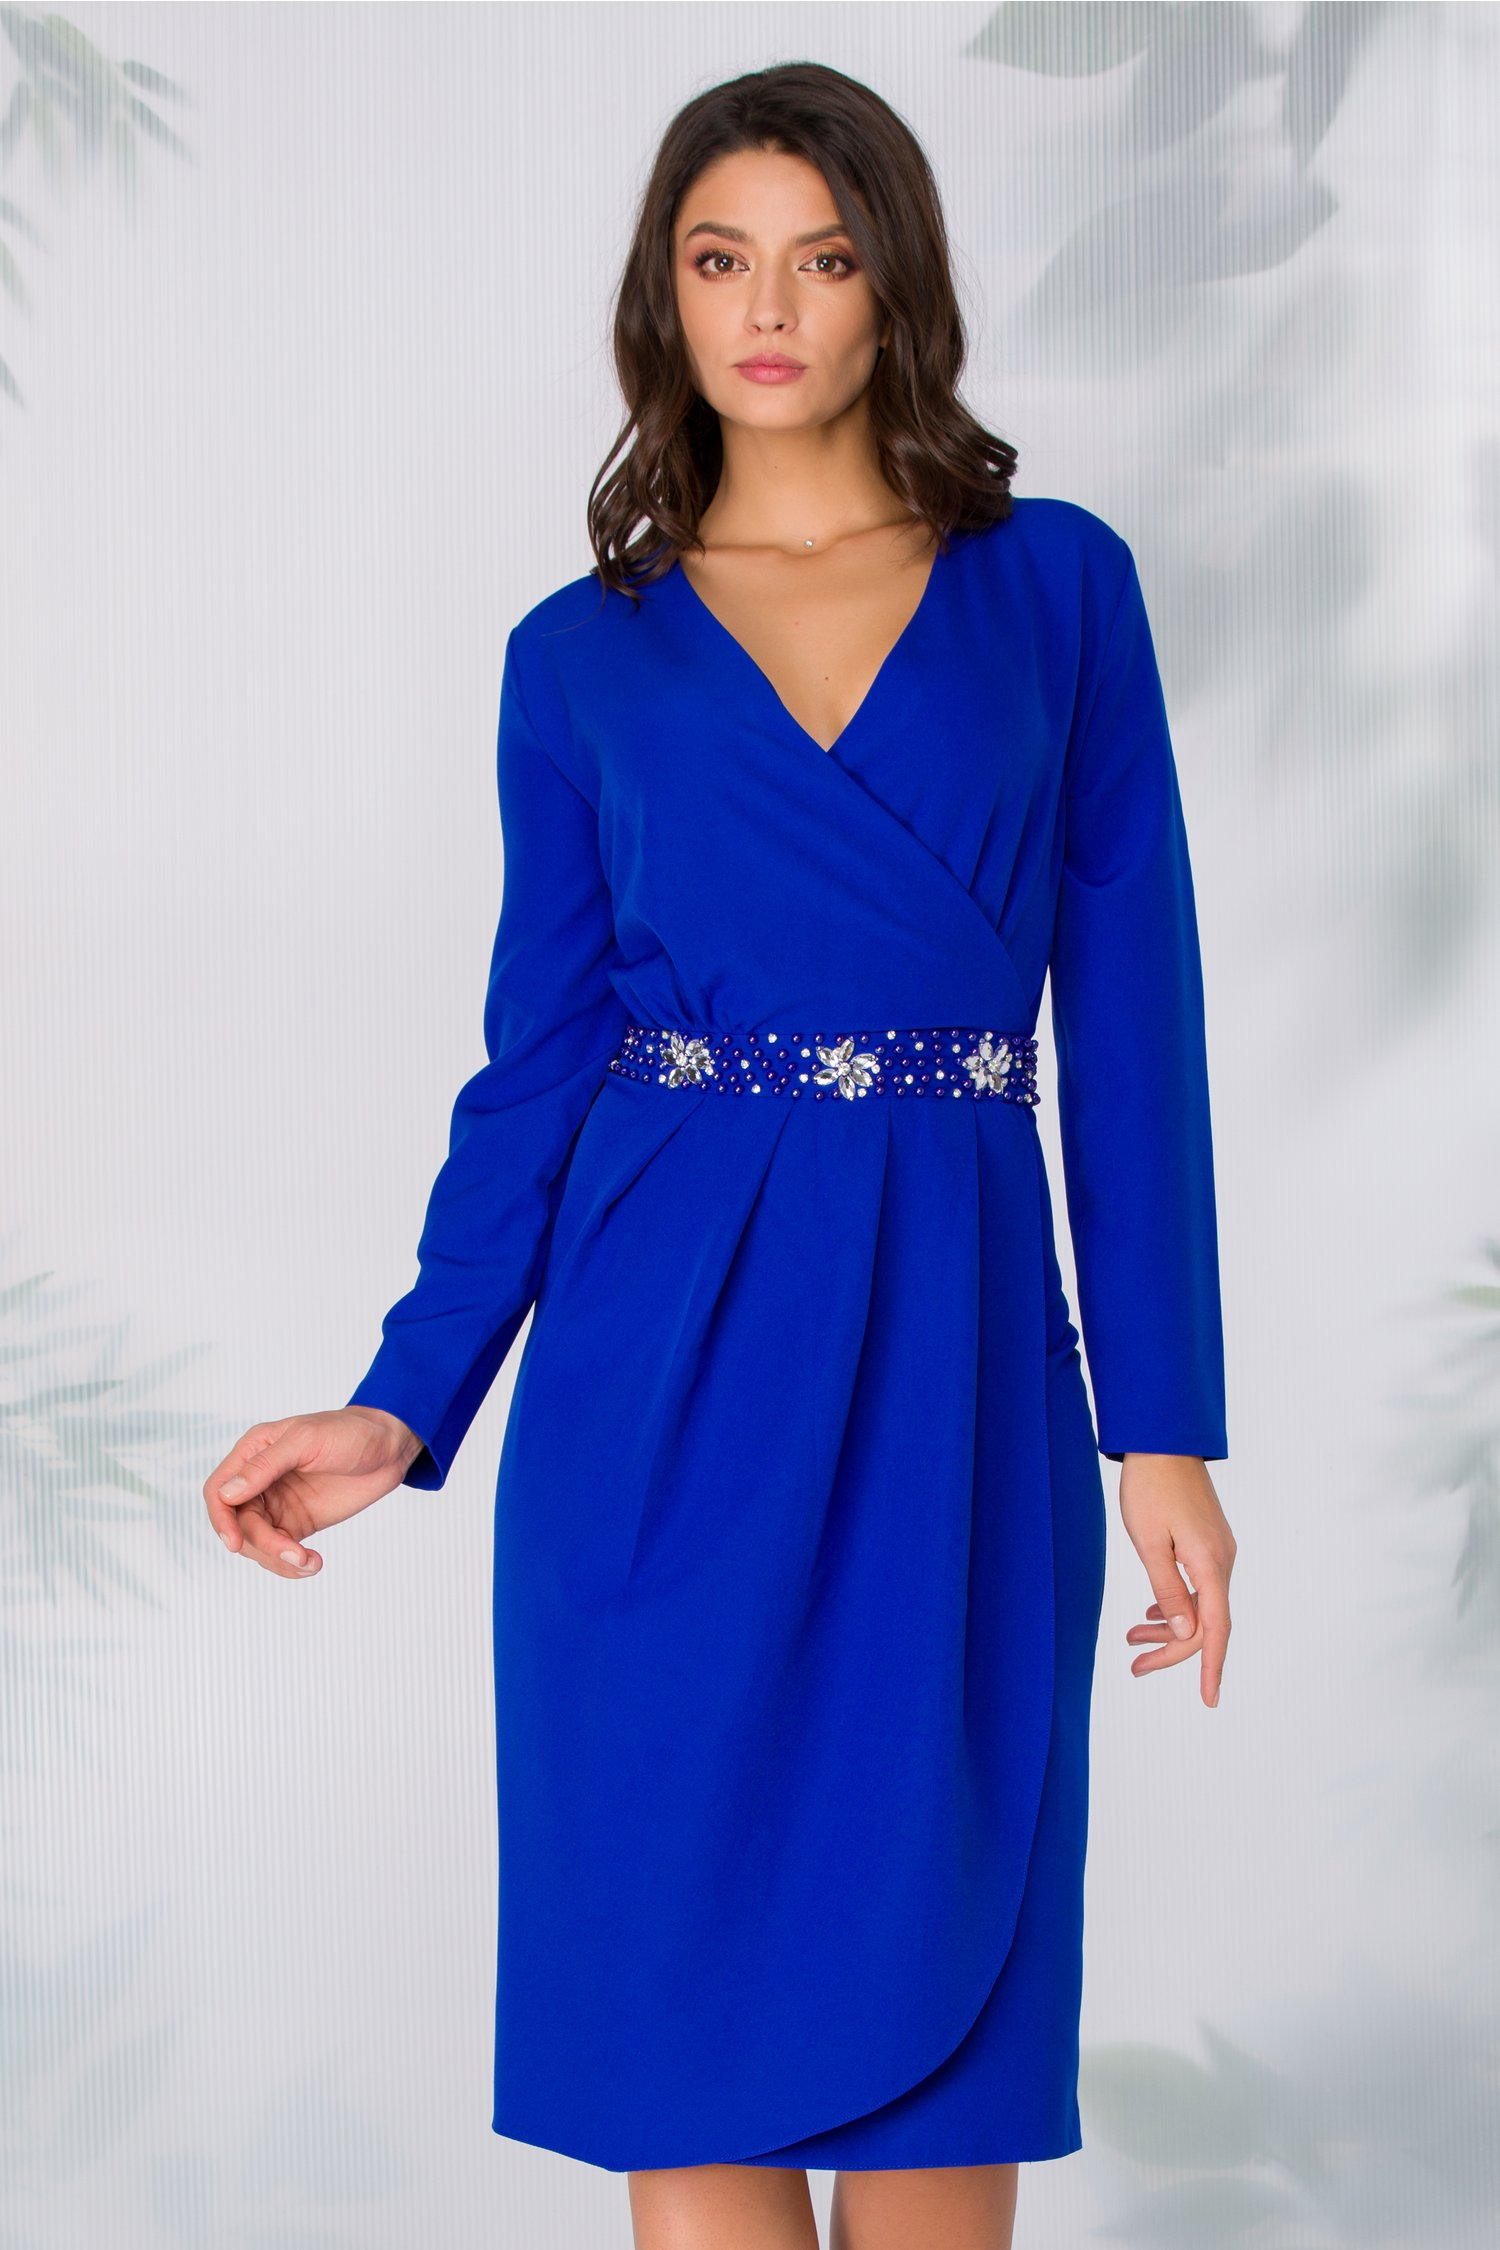 Rochie Adriella albastra cu aspect petrecut si strasuri in talie